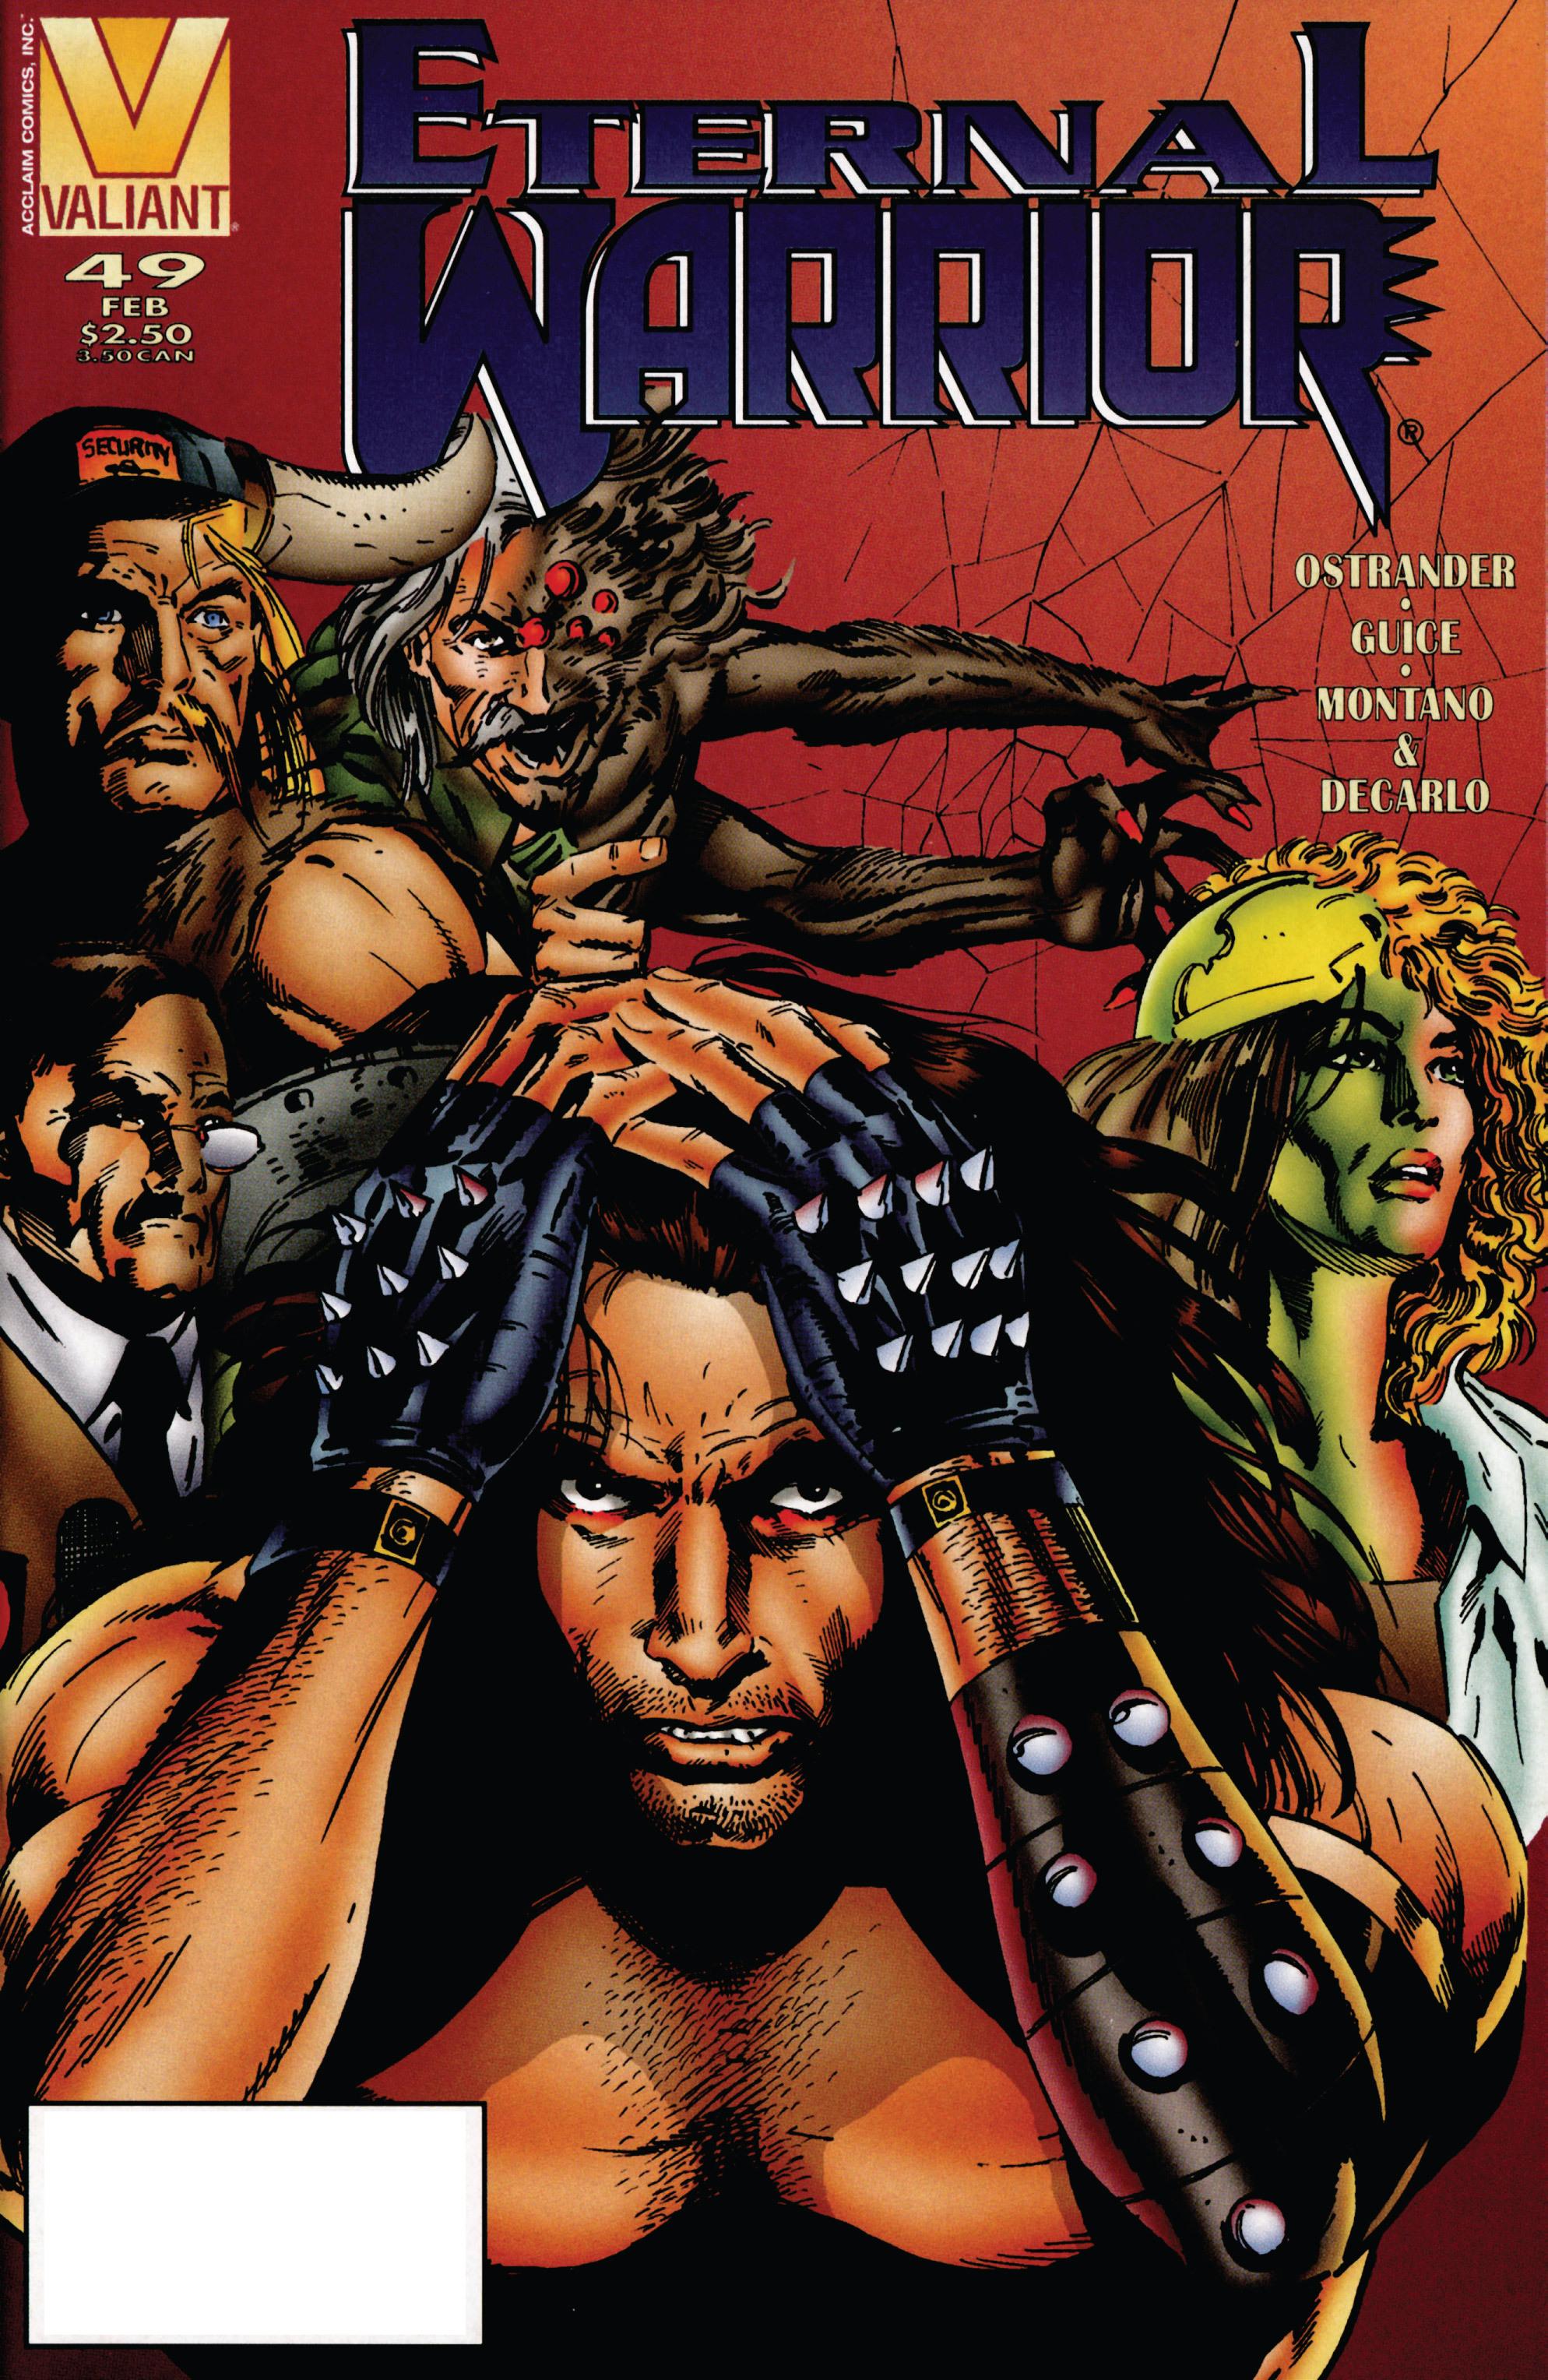 Read online Eternal Warrior (1992) comic -  Issue #49 - 1